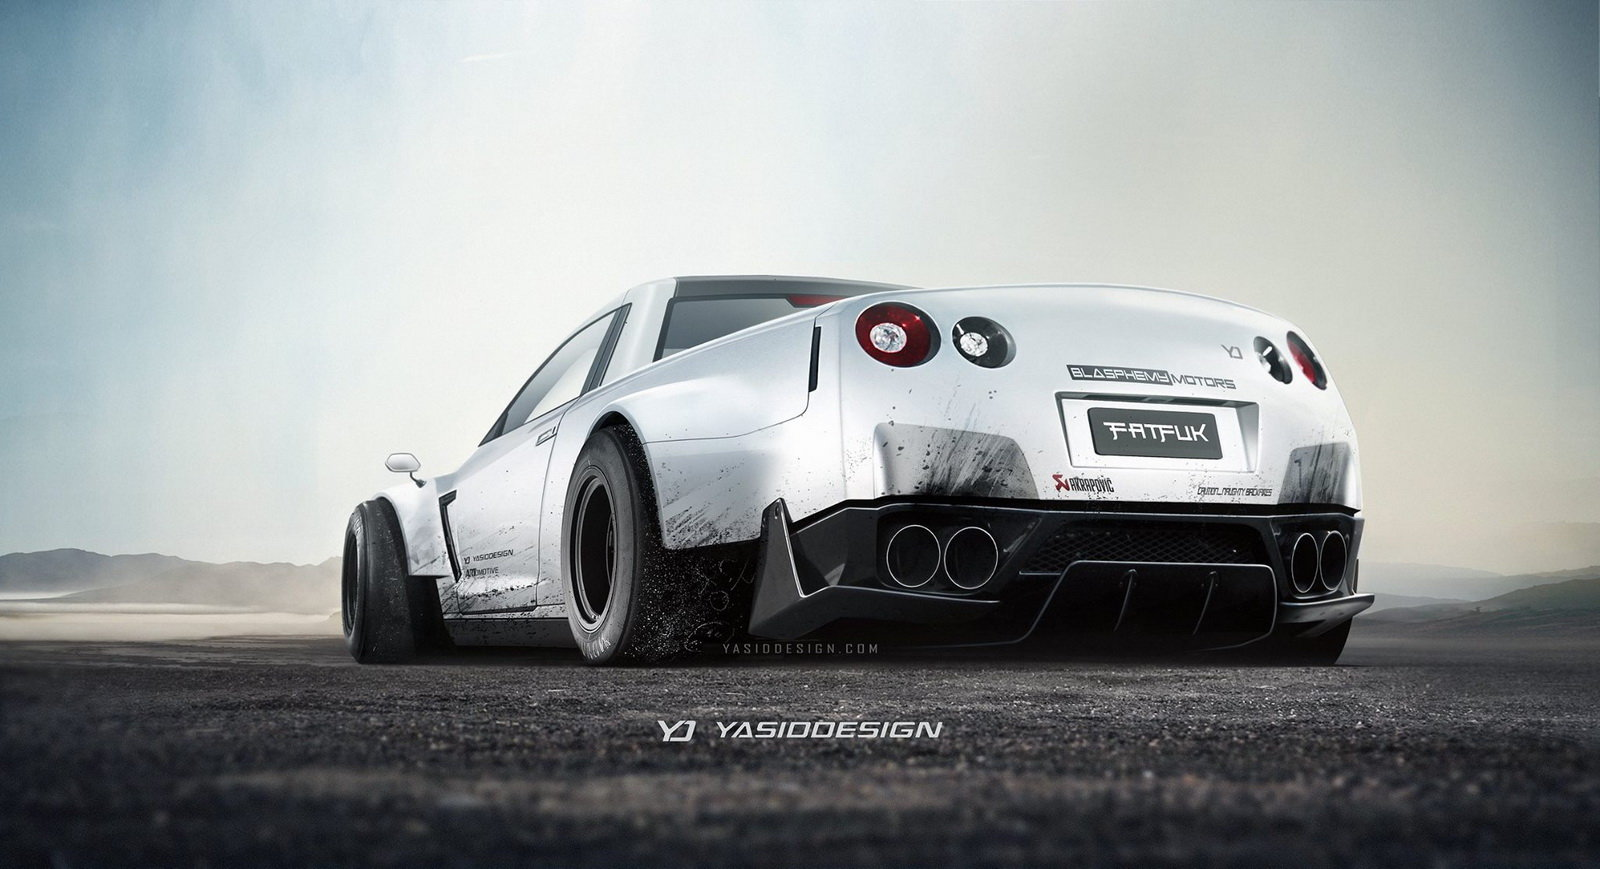 Supersporty jako pickup - Nissan GT-R